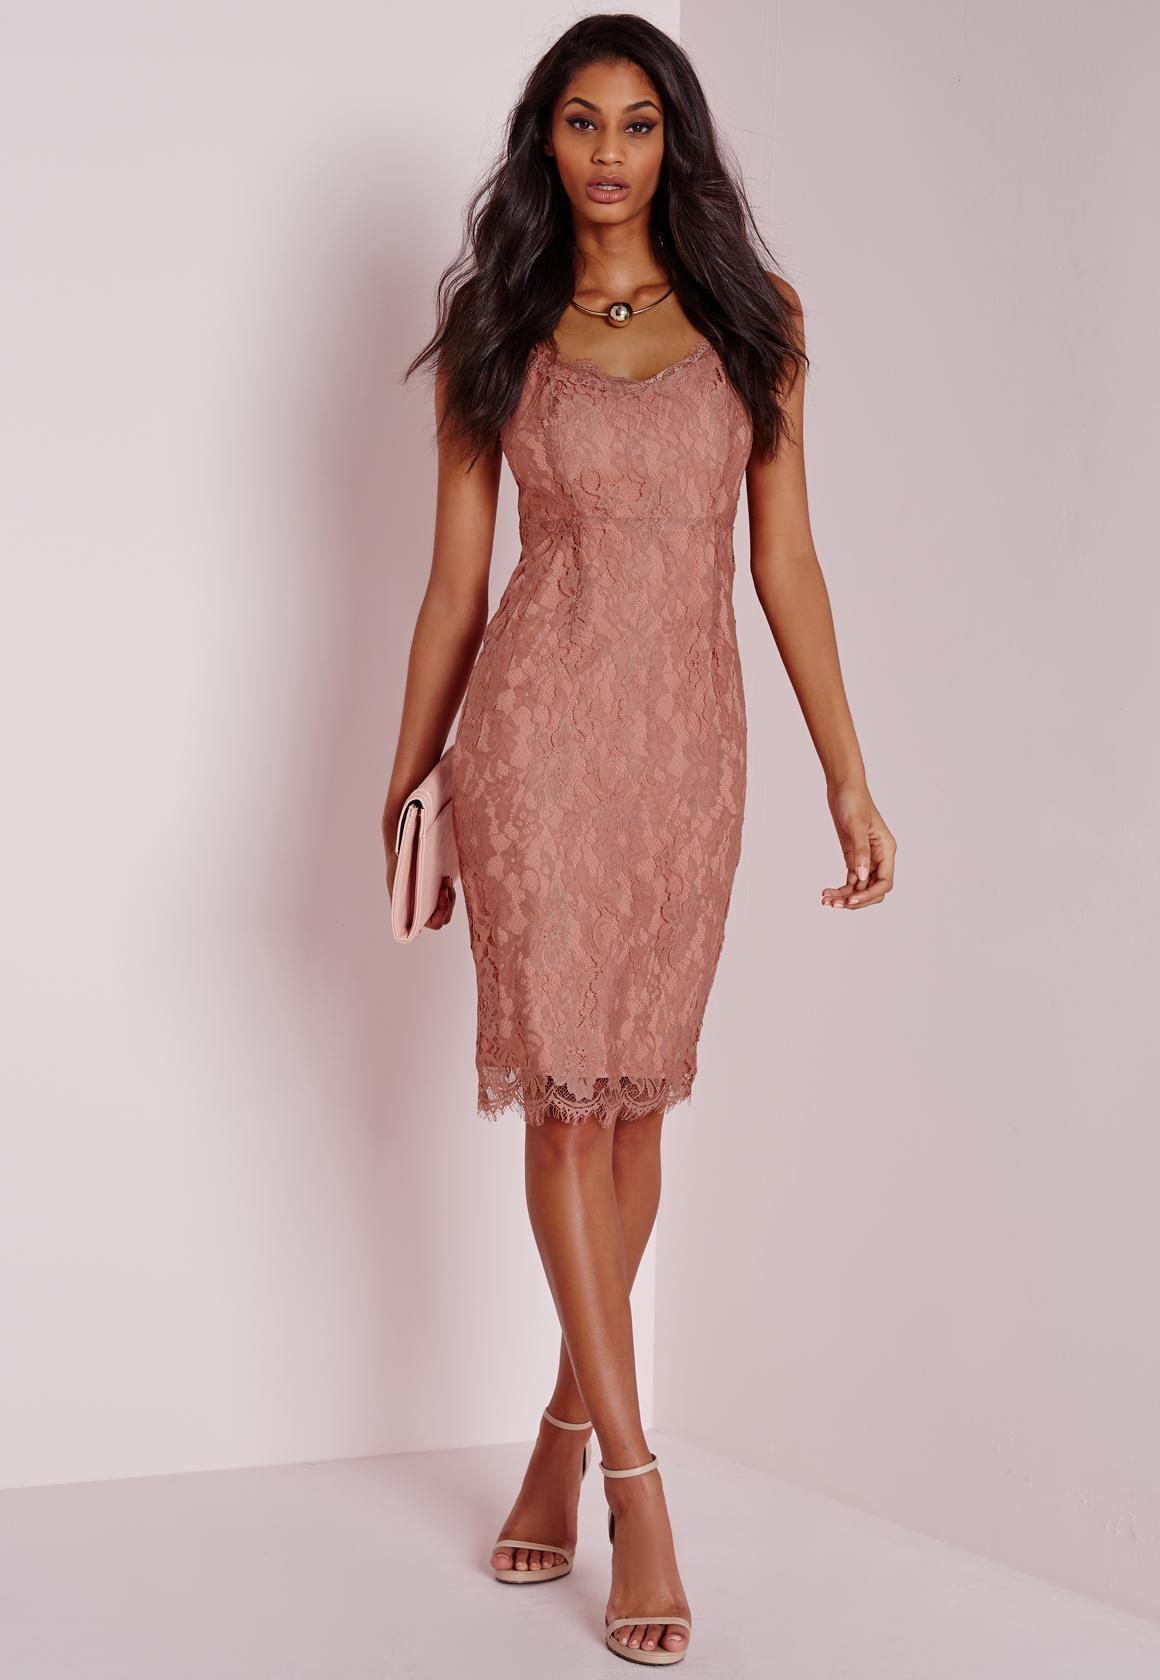 Dusky pink and black dress